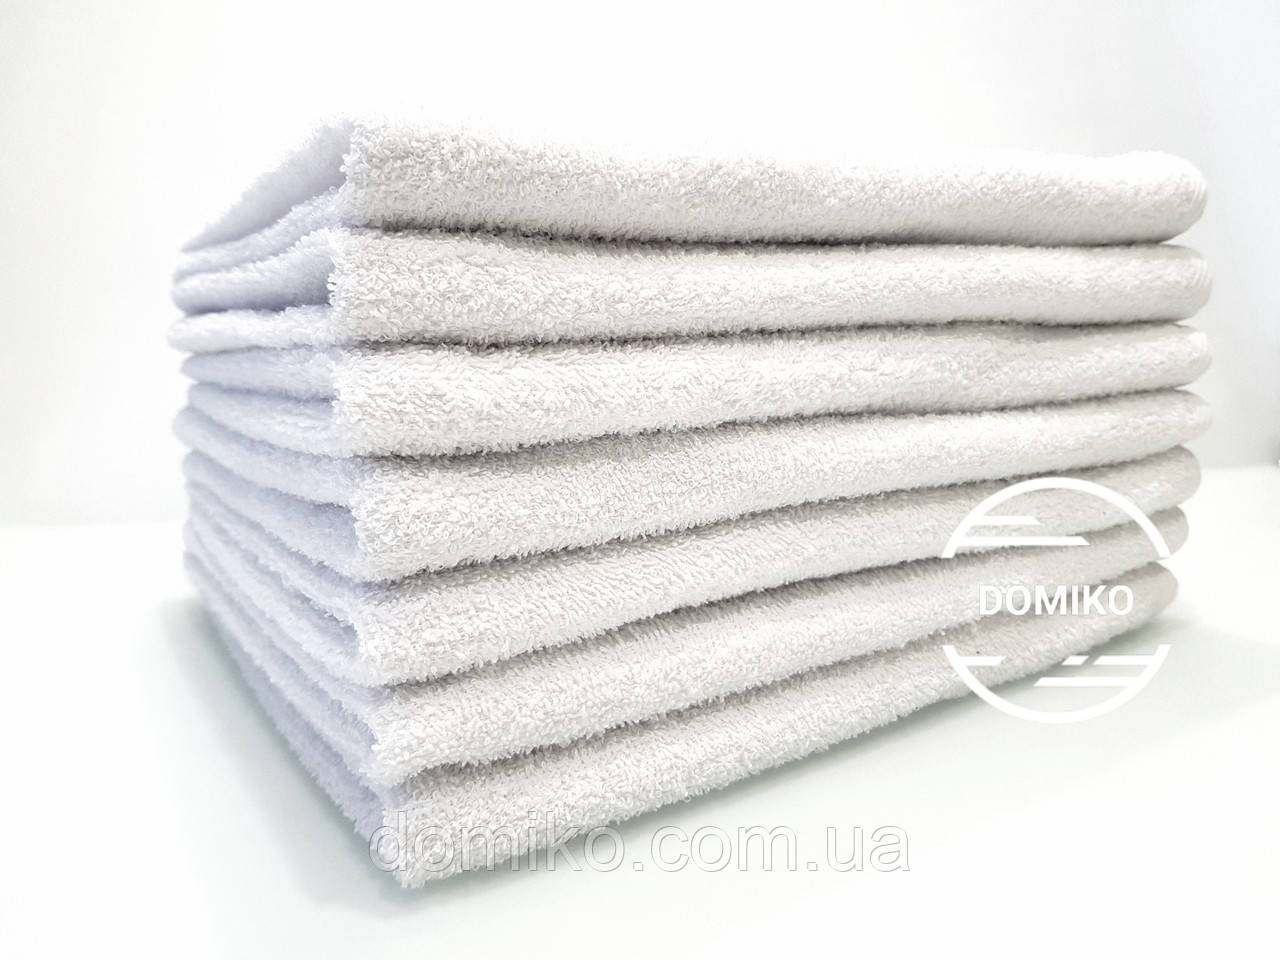 Полотенце кухонное махровое 40*70 белое Узбекистан